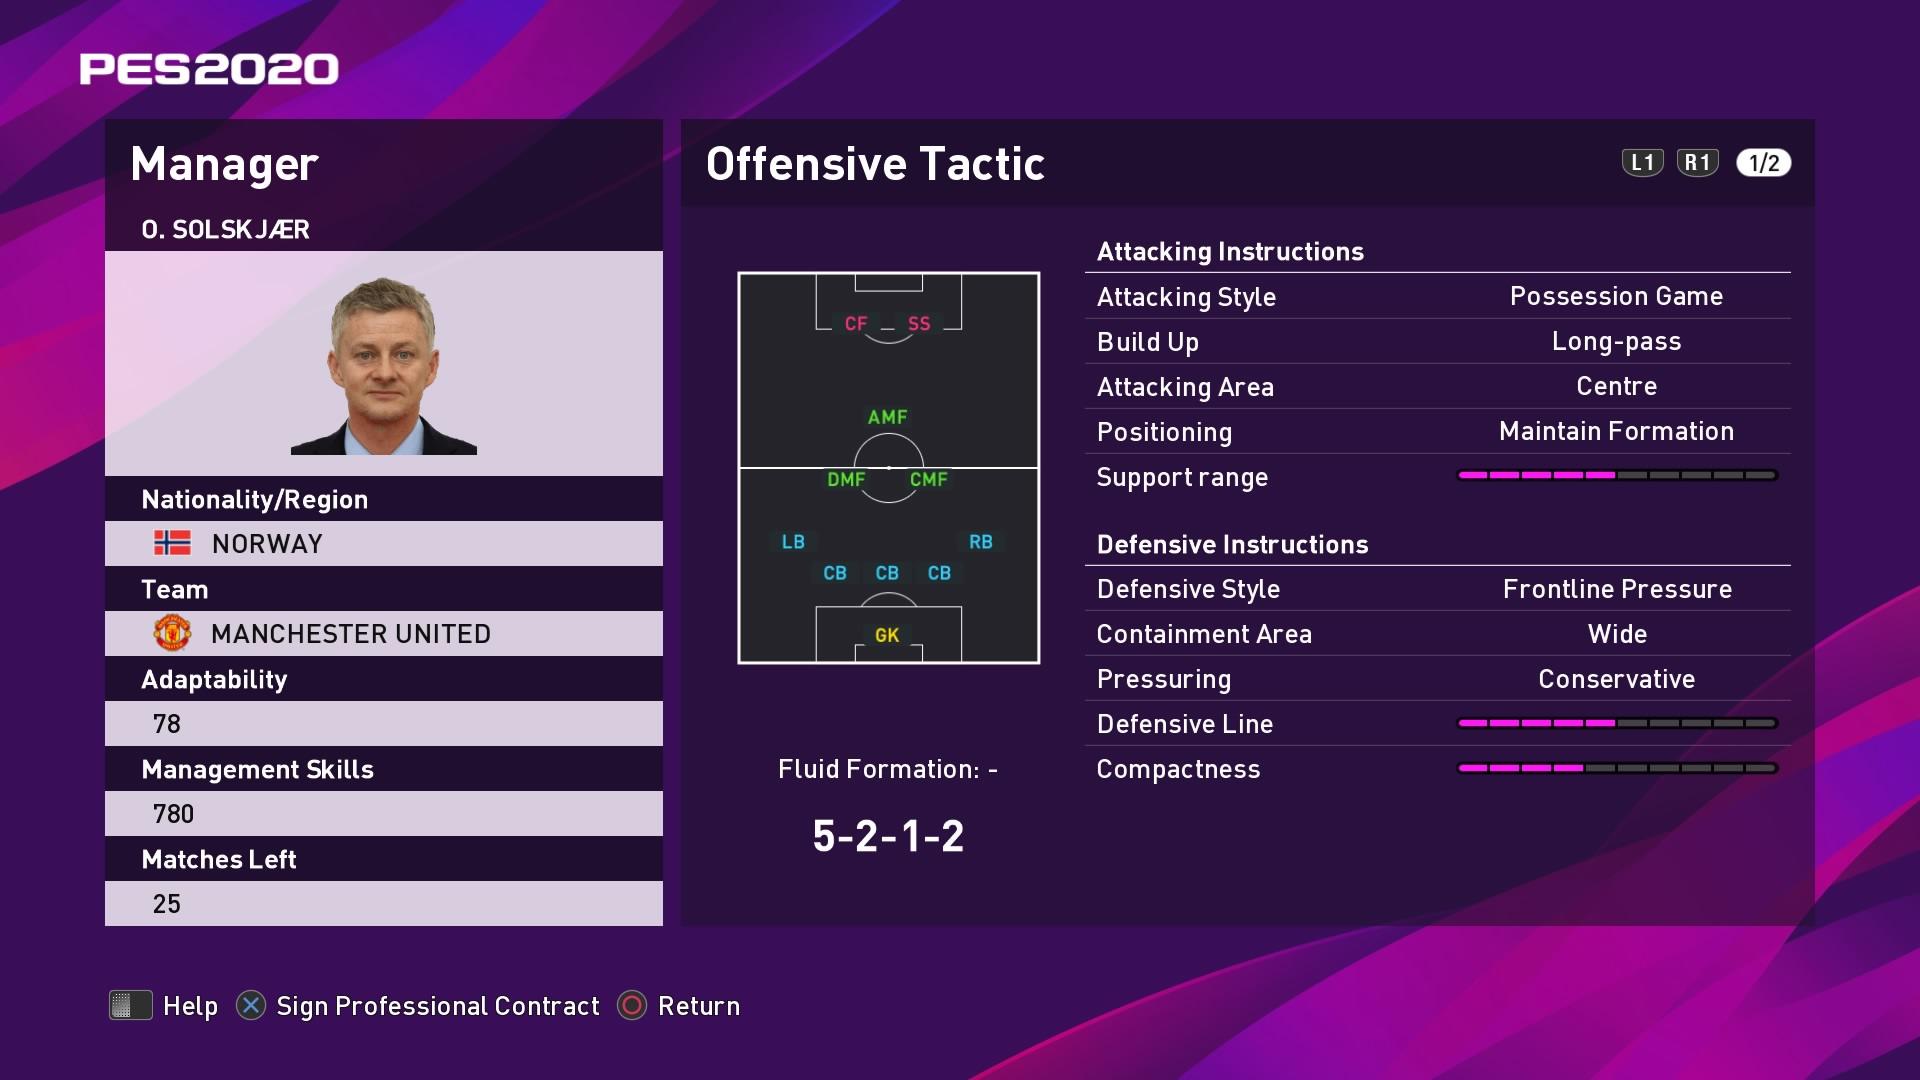 O. Solskjaer (2) (Ole Gunnar Solskjær) Offensive Tactic in PES 2020 myClub